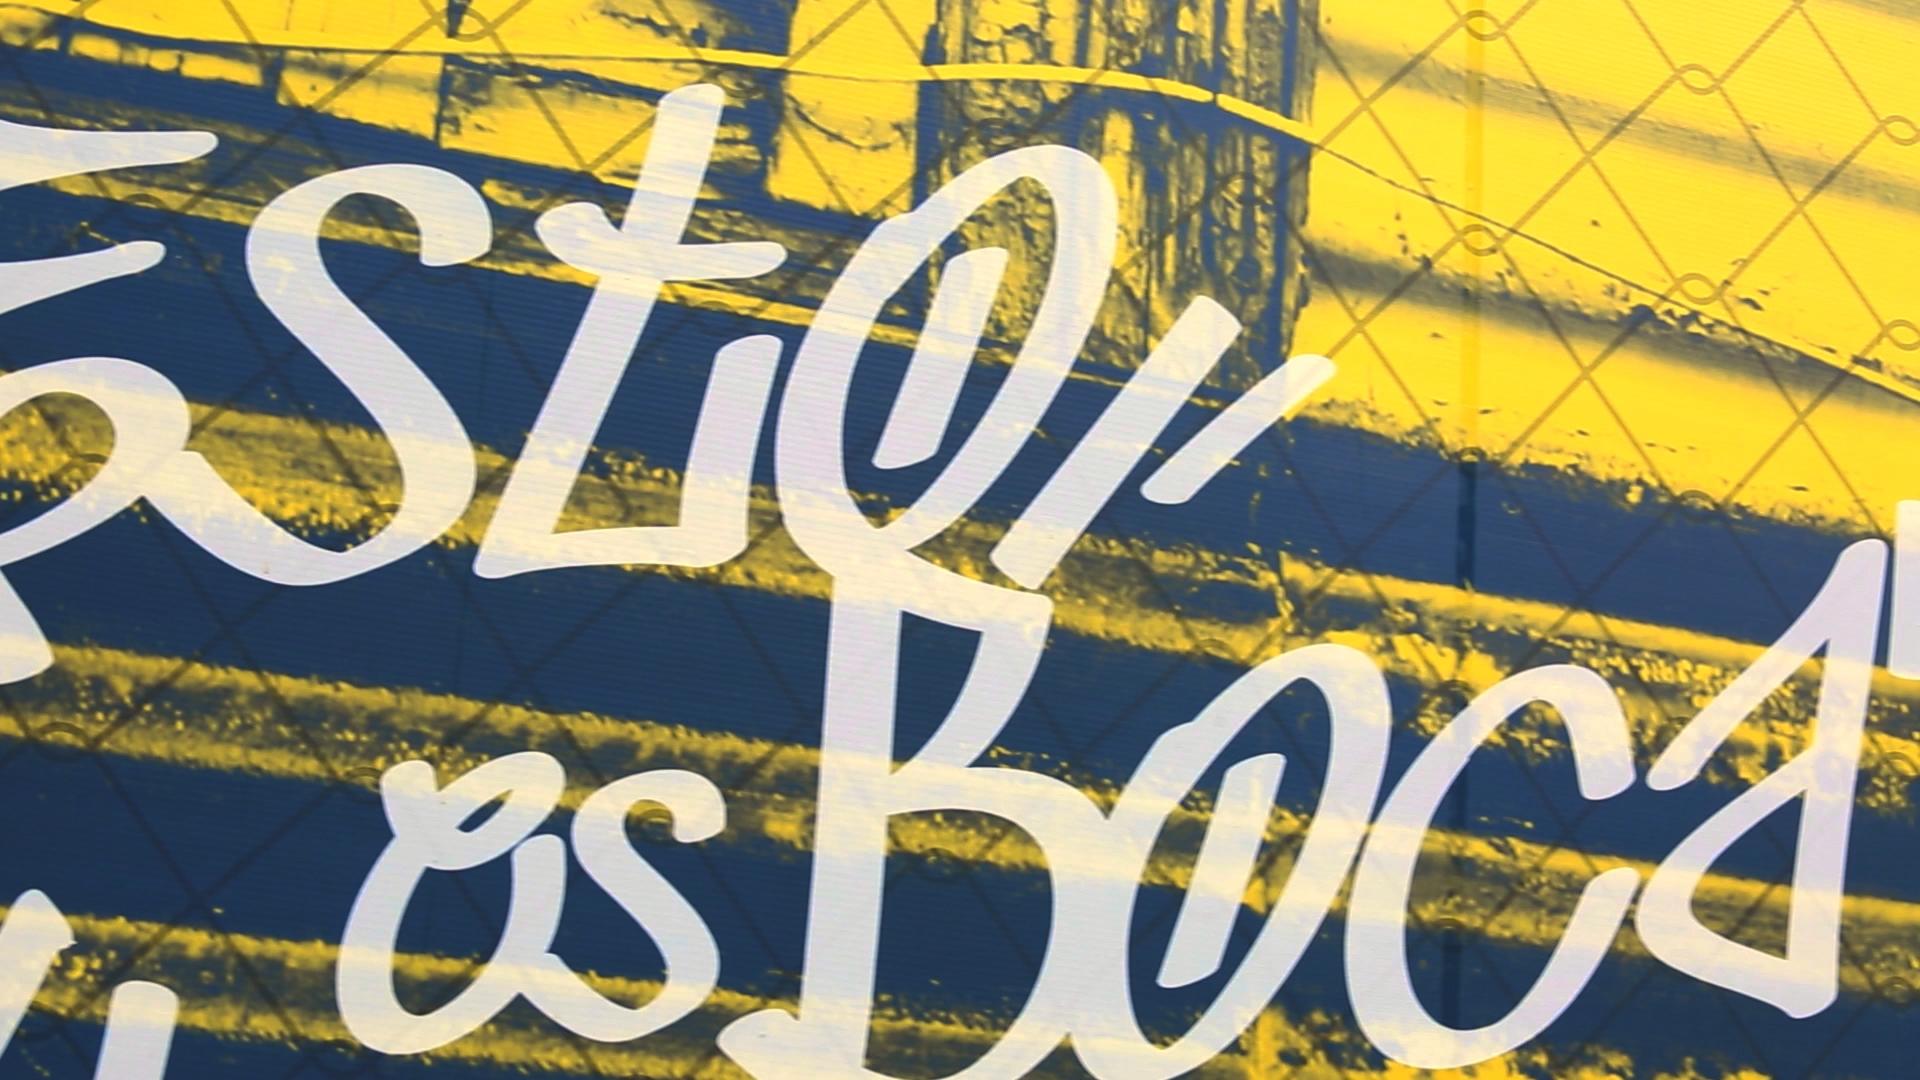 This is Boca Typography_9.jpg